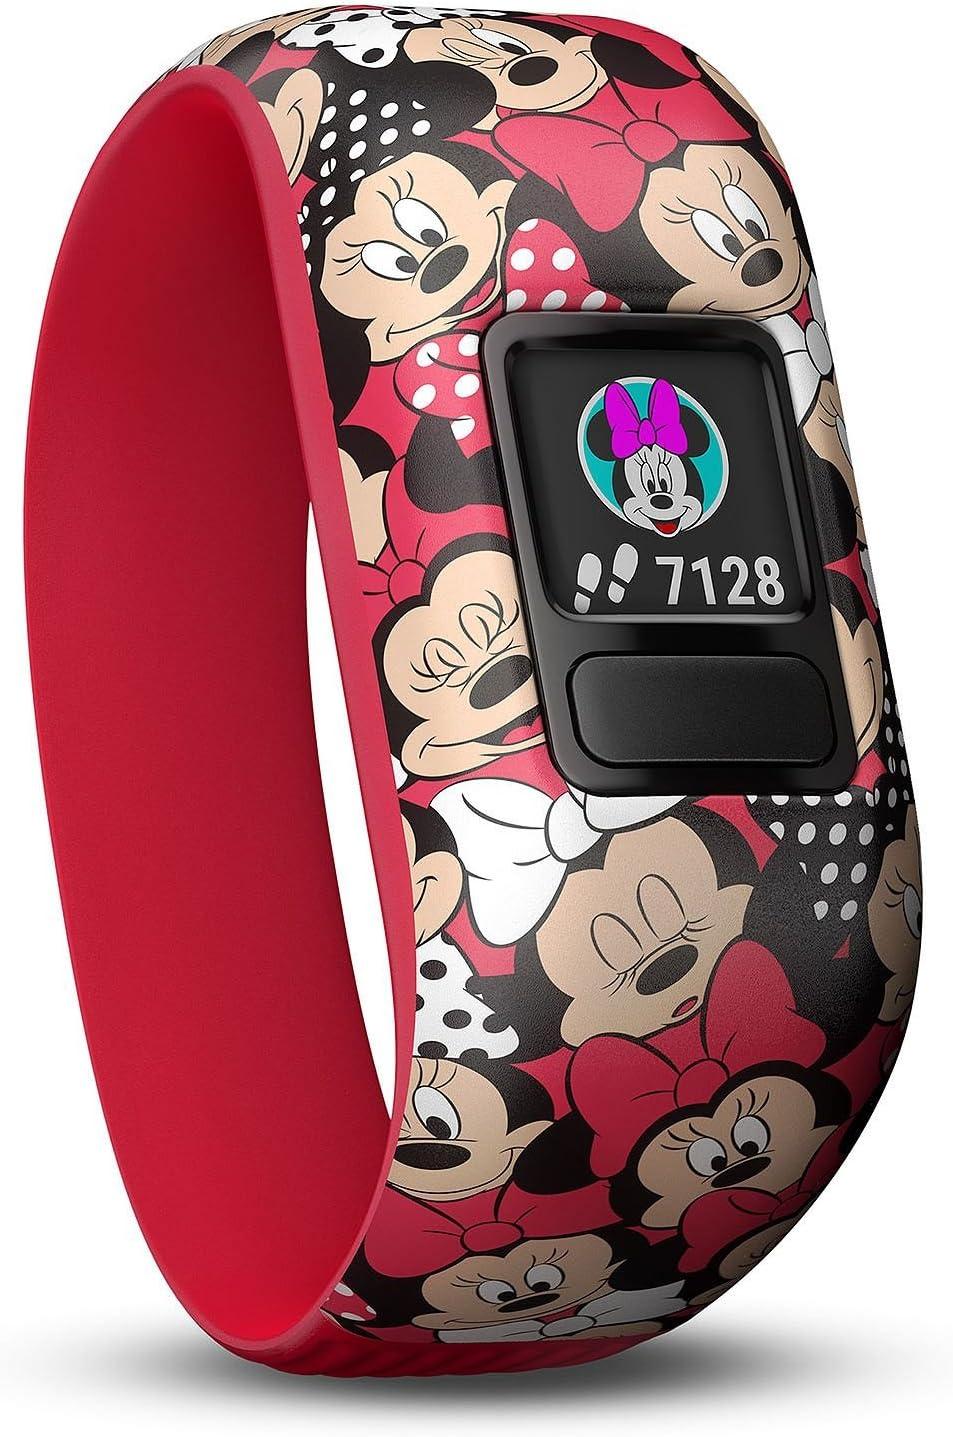 Garmin 010-01909-42 vivo fit jr. 2 Activity Tracker – Stretchy Band w Extra Black Band, Disney Minnie Mouse Black